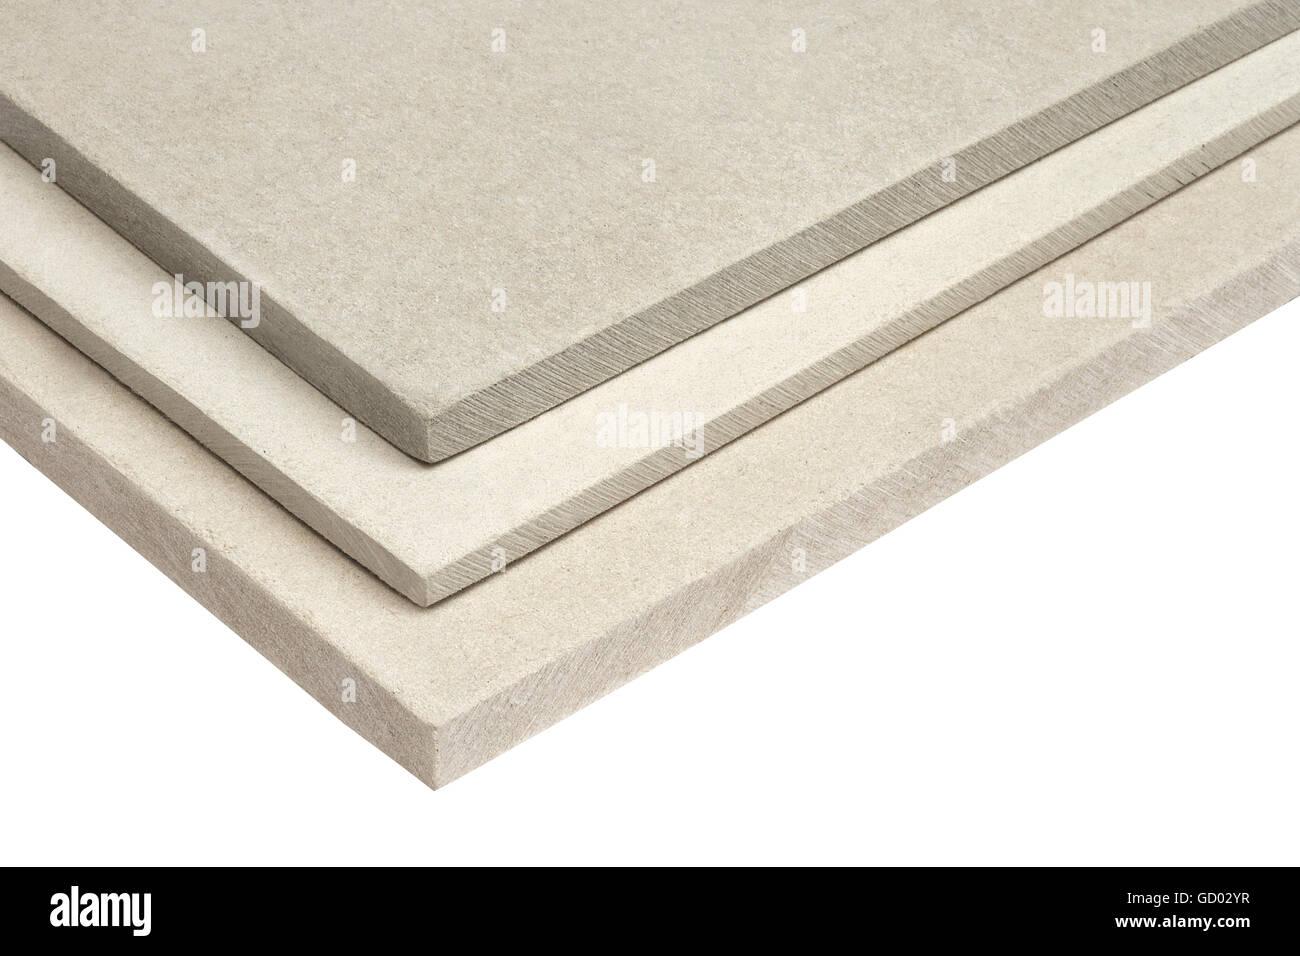 Gypsum Board Stack Corner Isolated On White Background